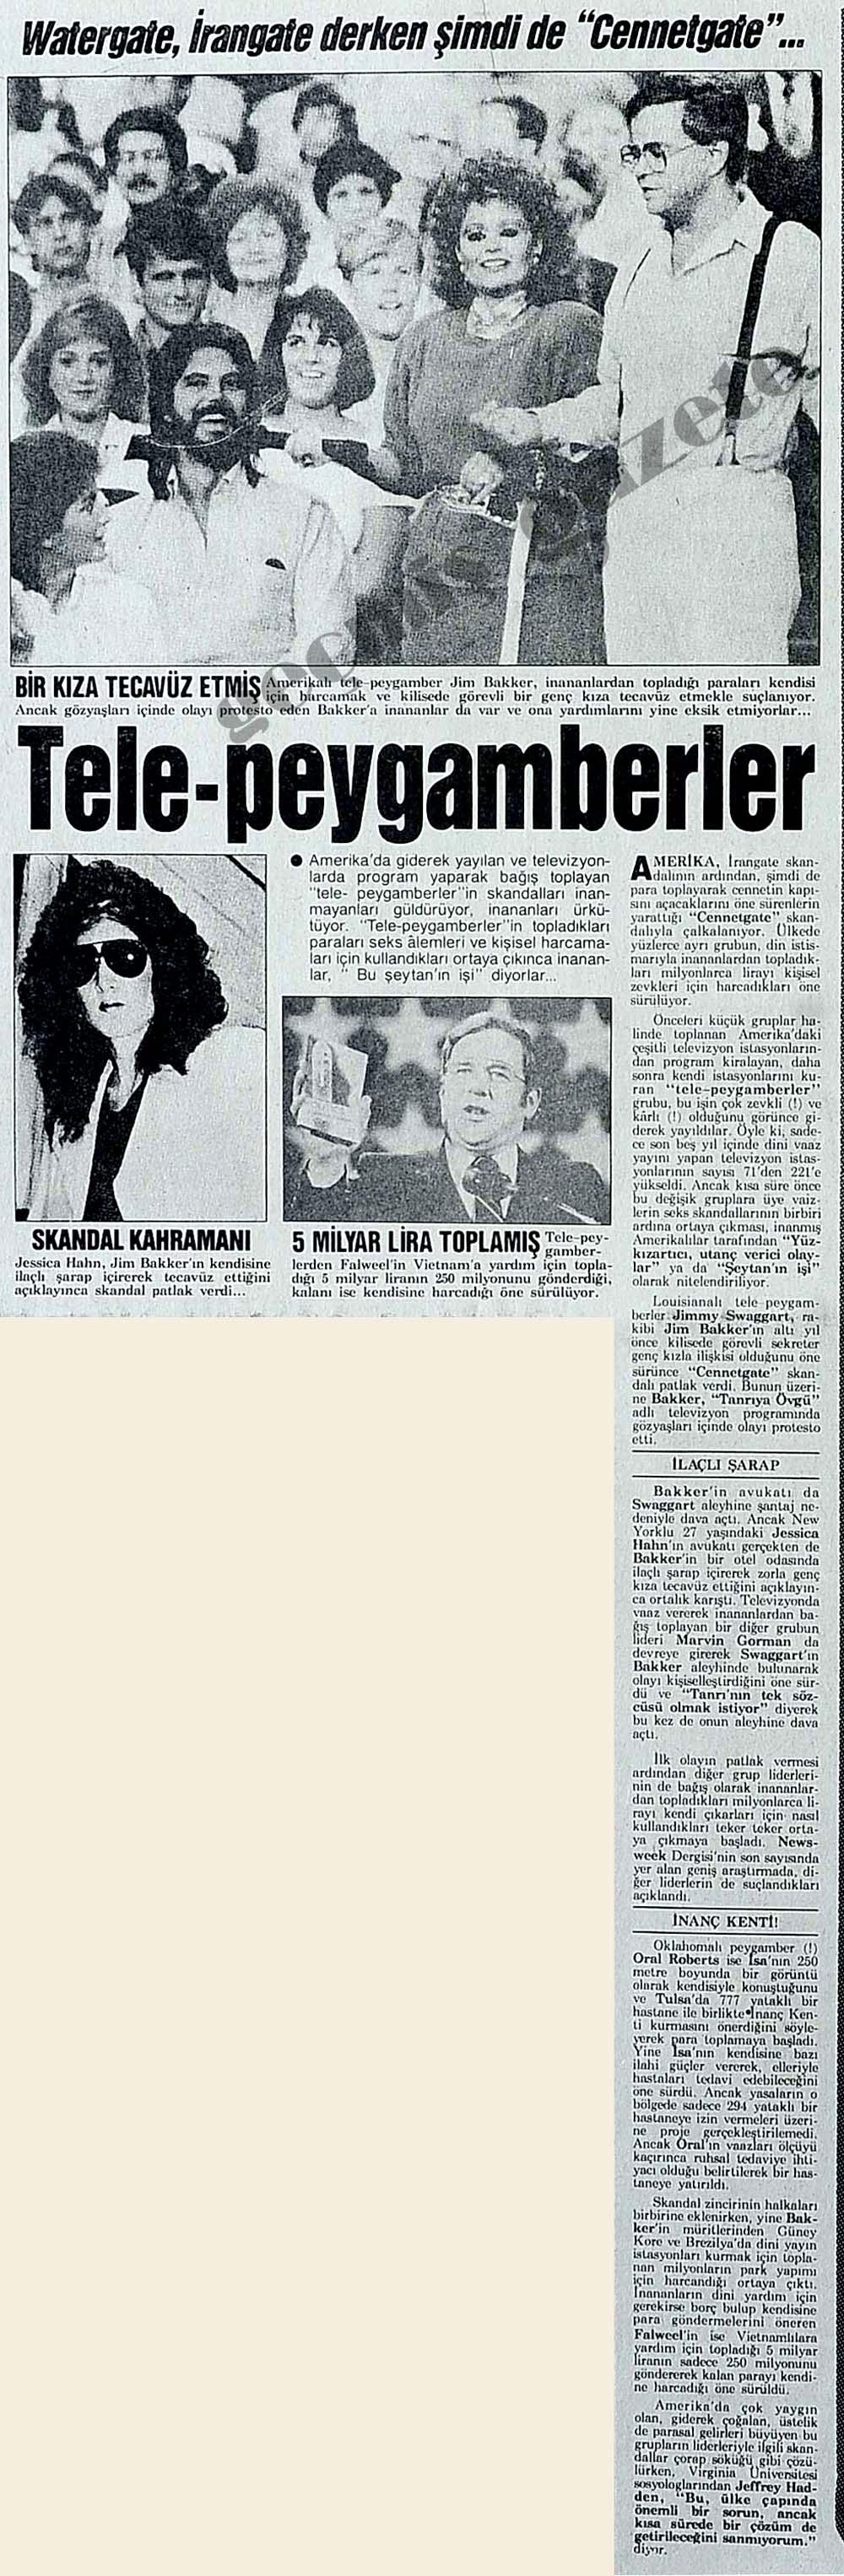 "Watergate, İrangate derken şimdi de ""Cennetgate""..."